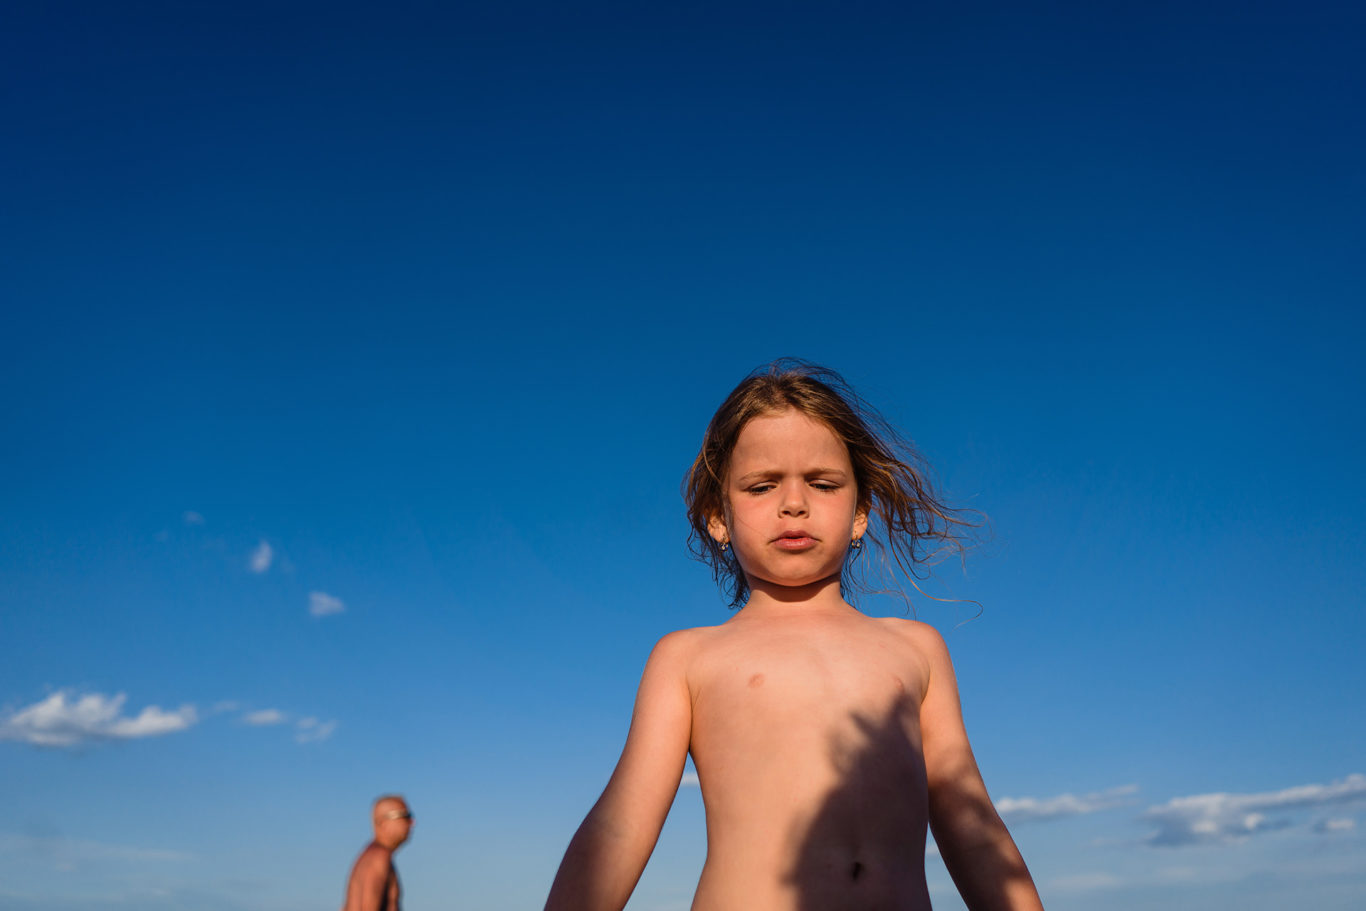 M-am suparat nitel - - fotograf de familie Ciprian Dumitrescu